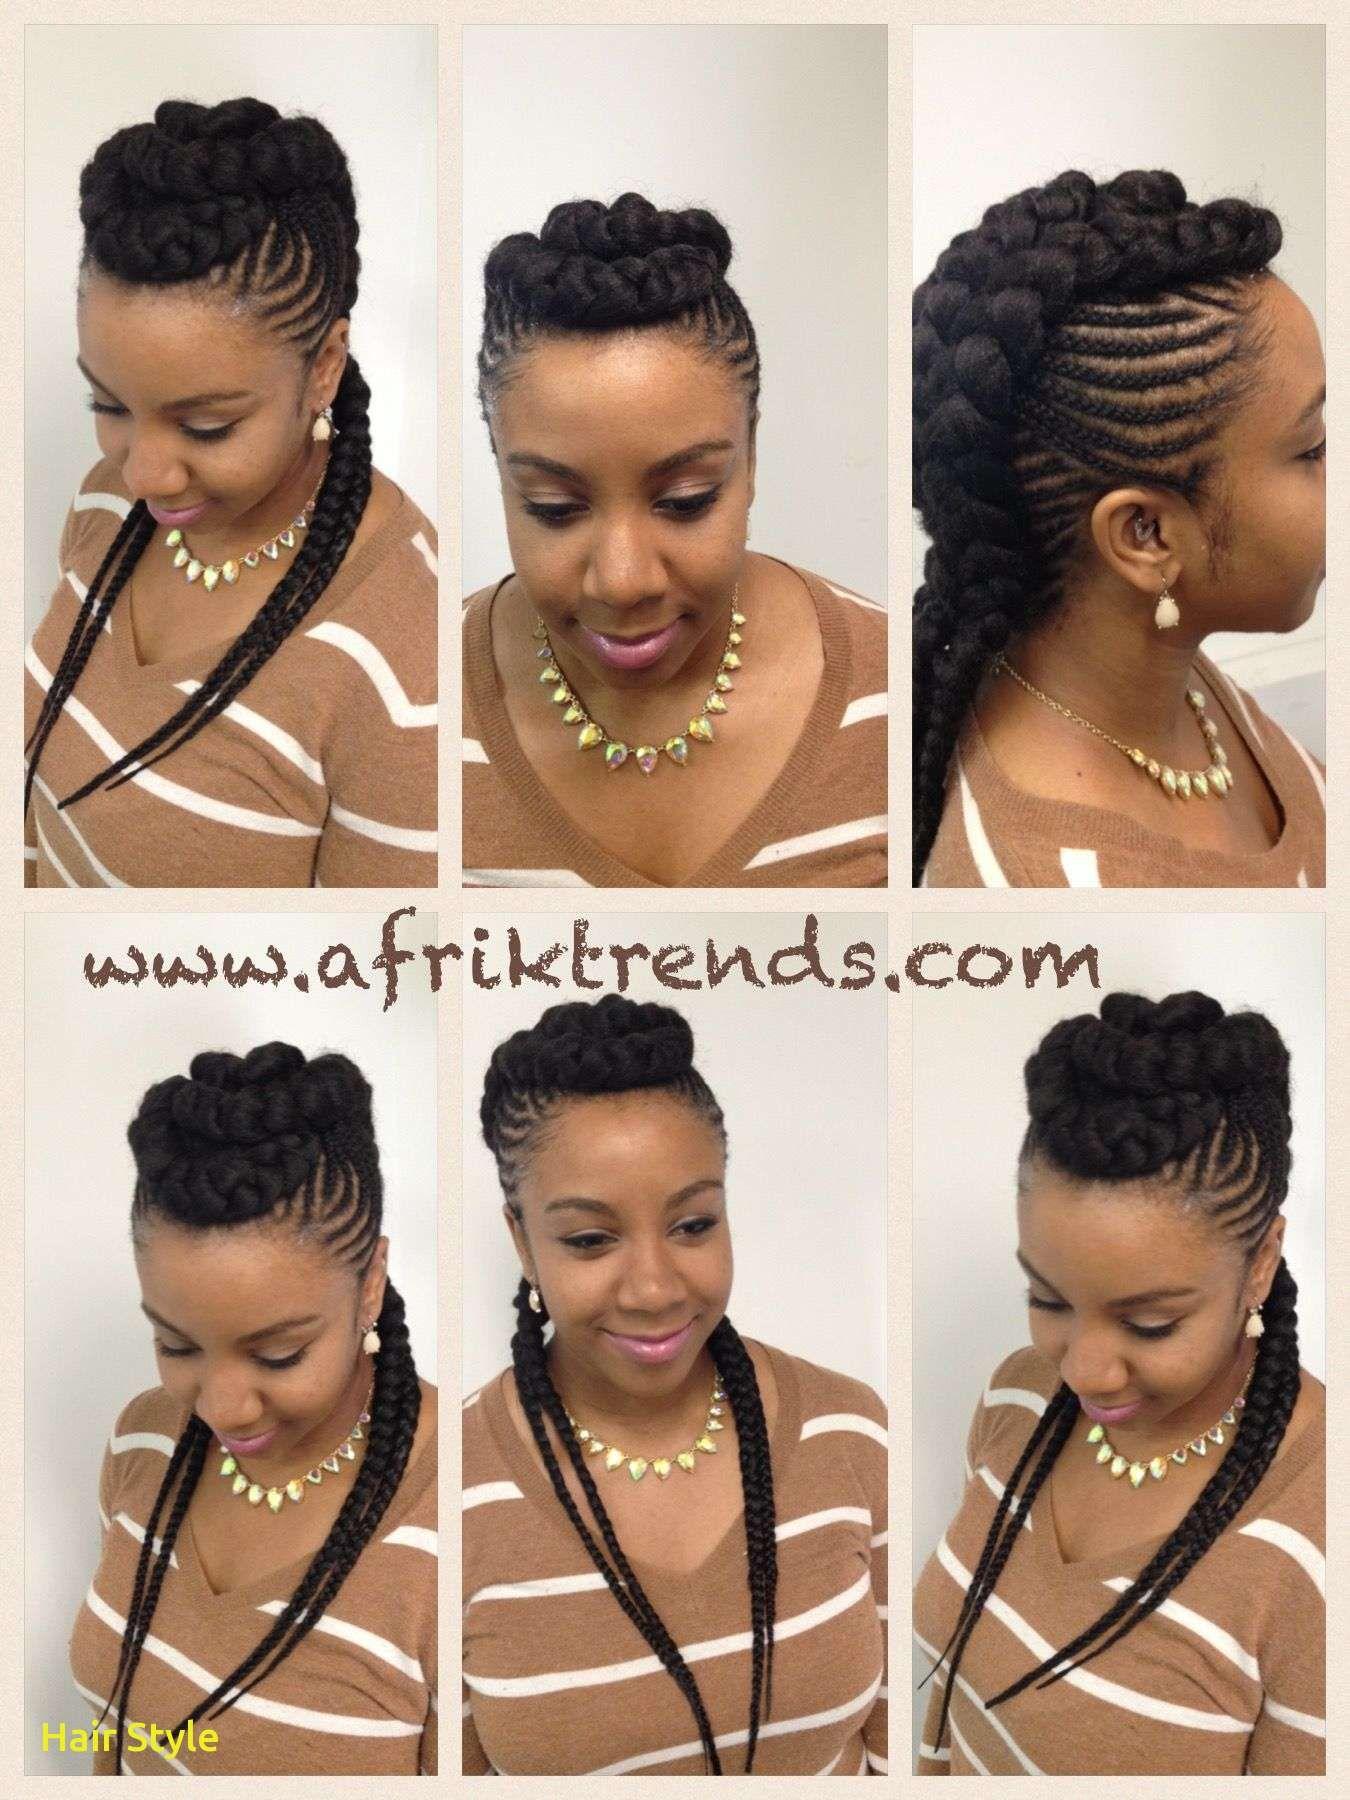 Elegante Schwarze Frauen Mohikaner Haar Arten Frisuren Mohawk Frisur Und Neue Frisuren